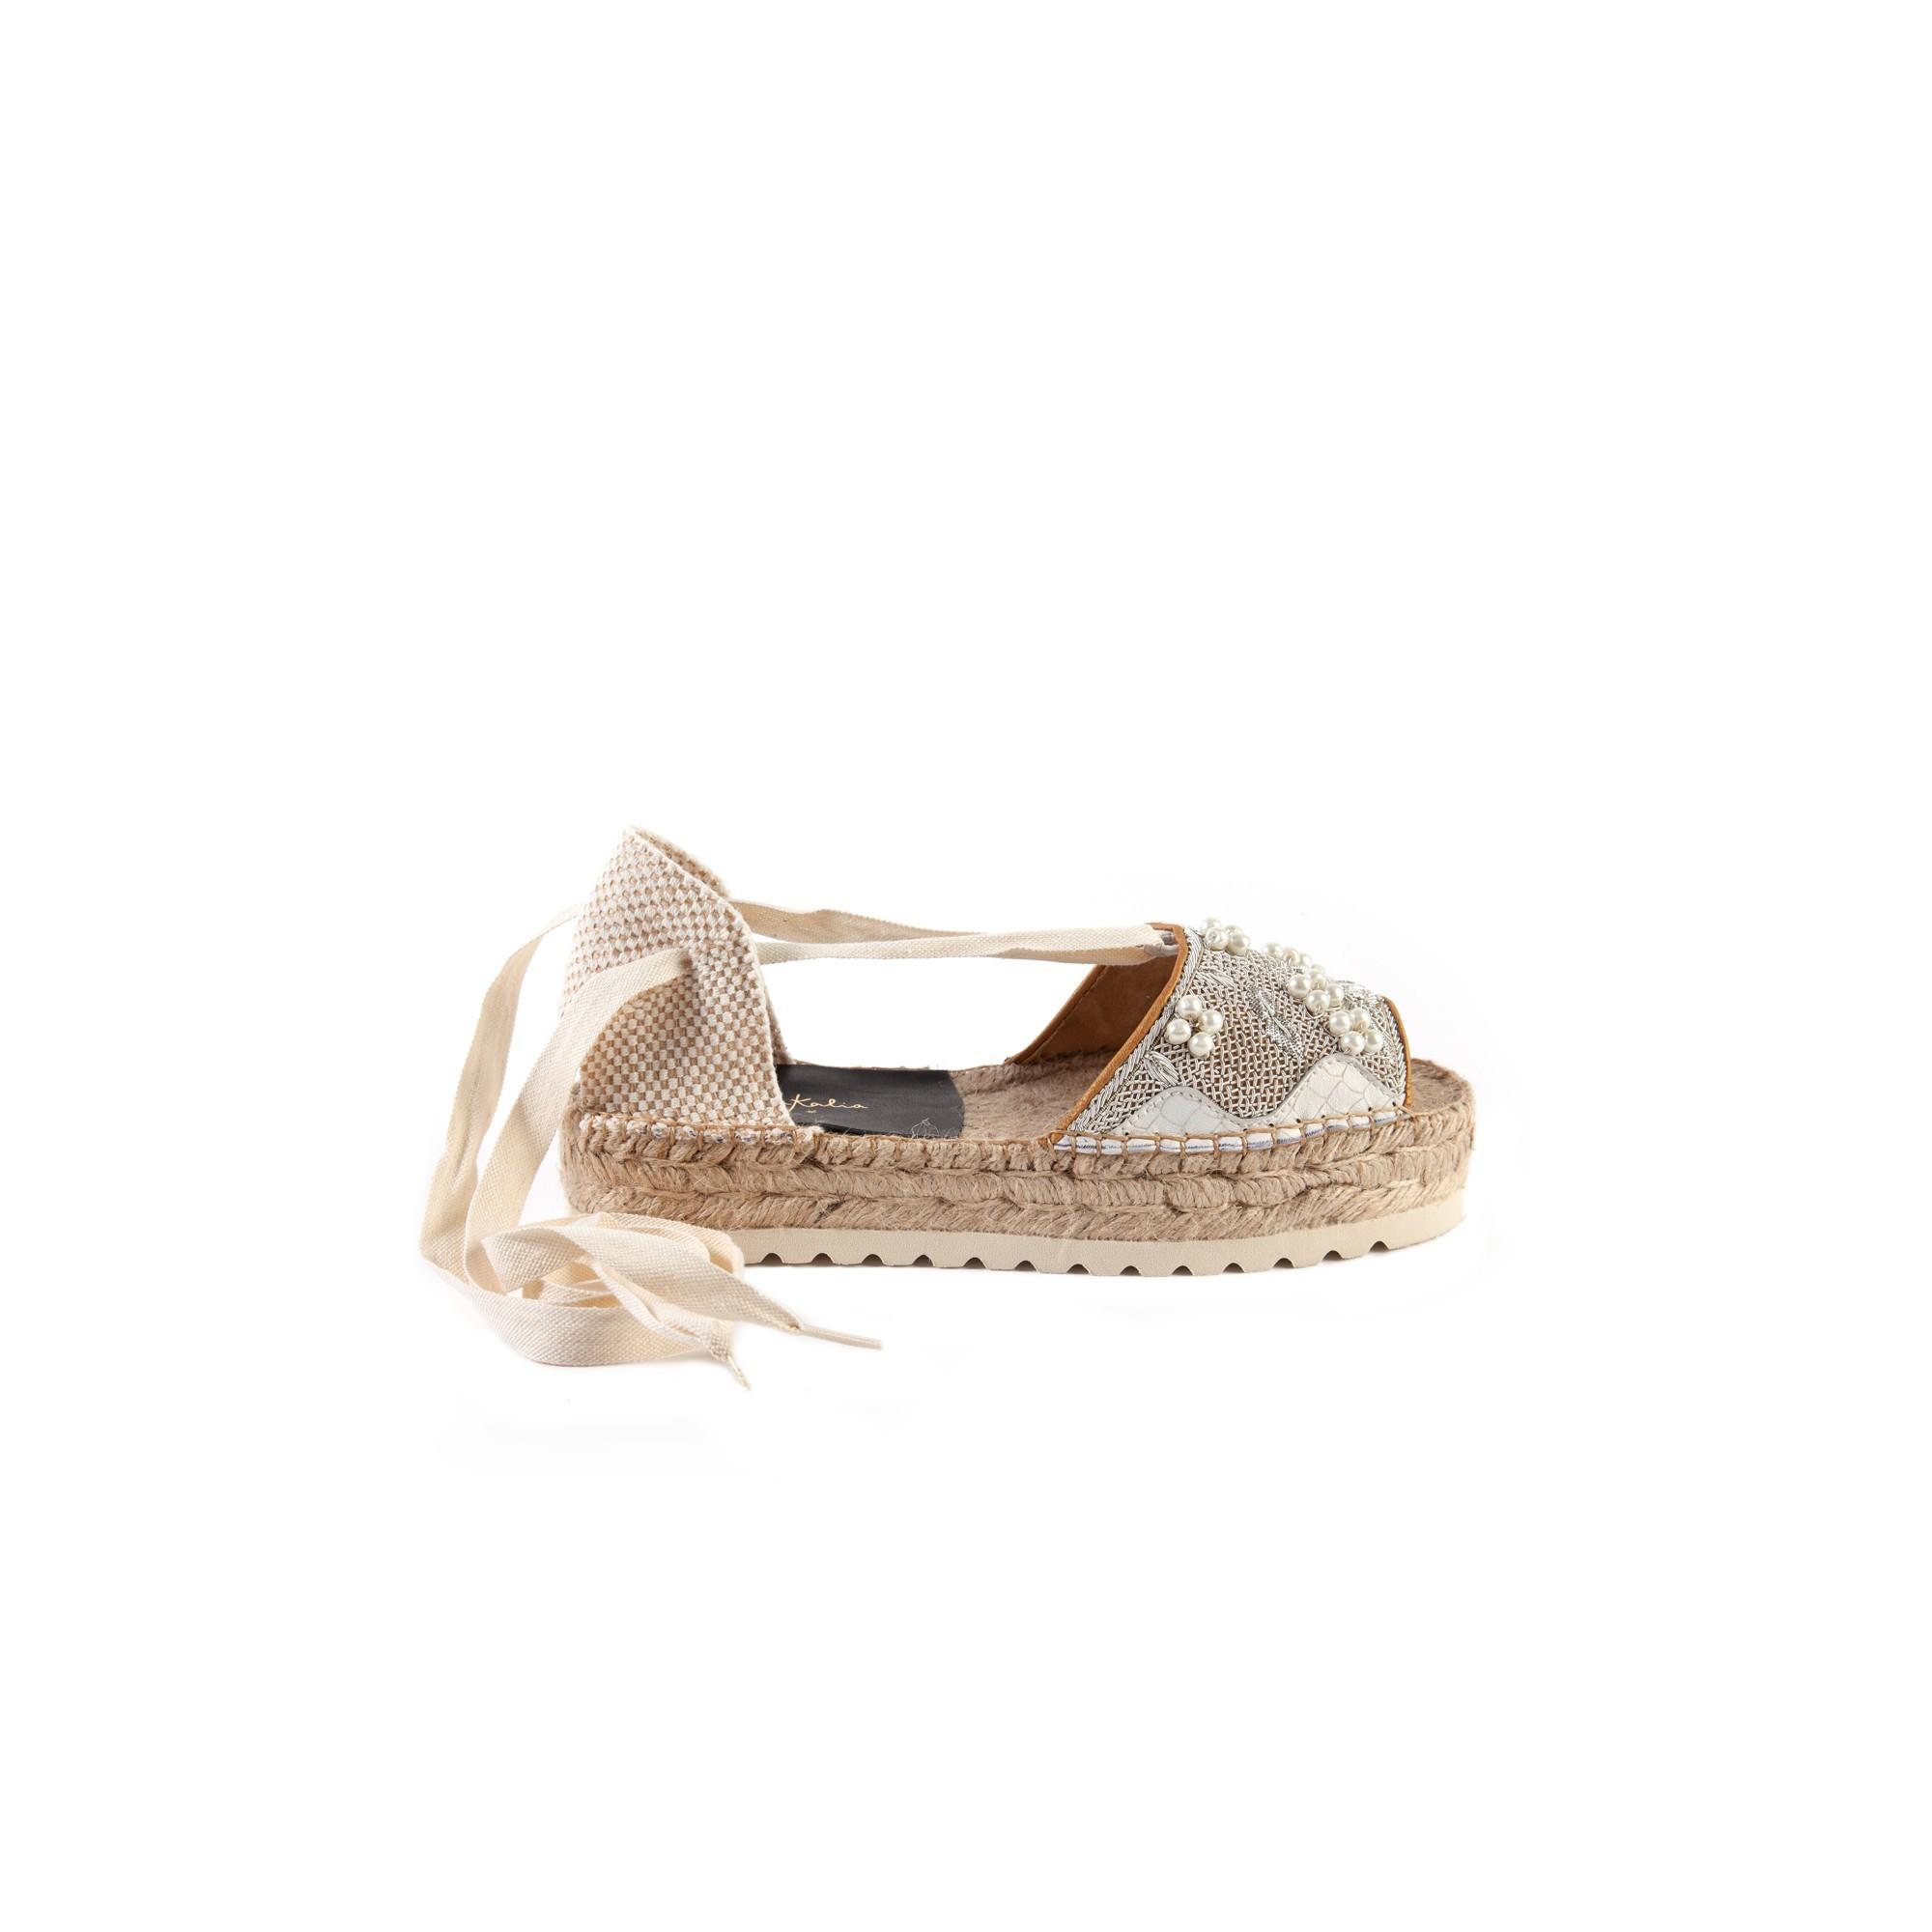 SPORTY YUCA BLOC - snake white/white pearl